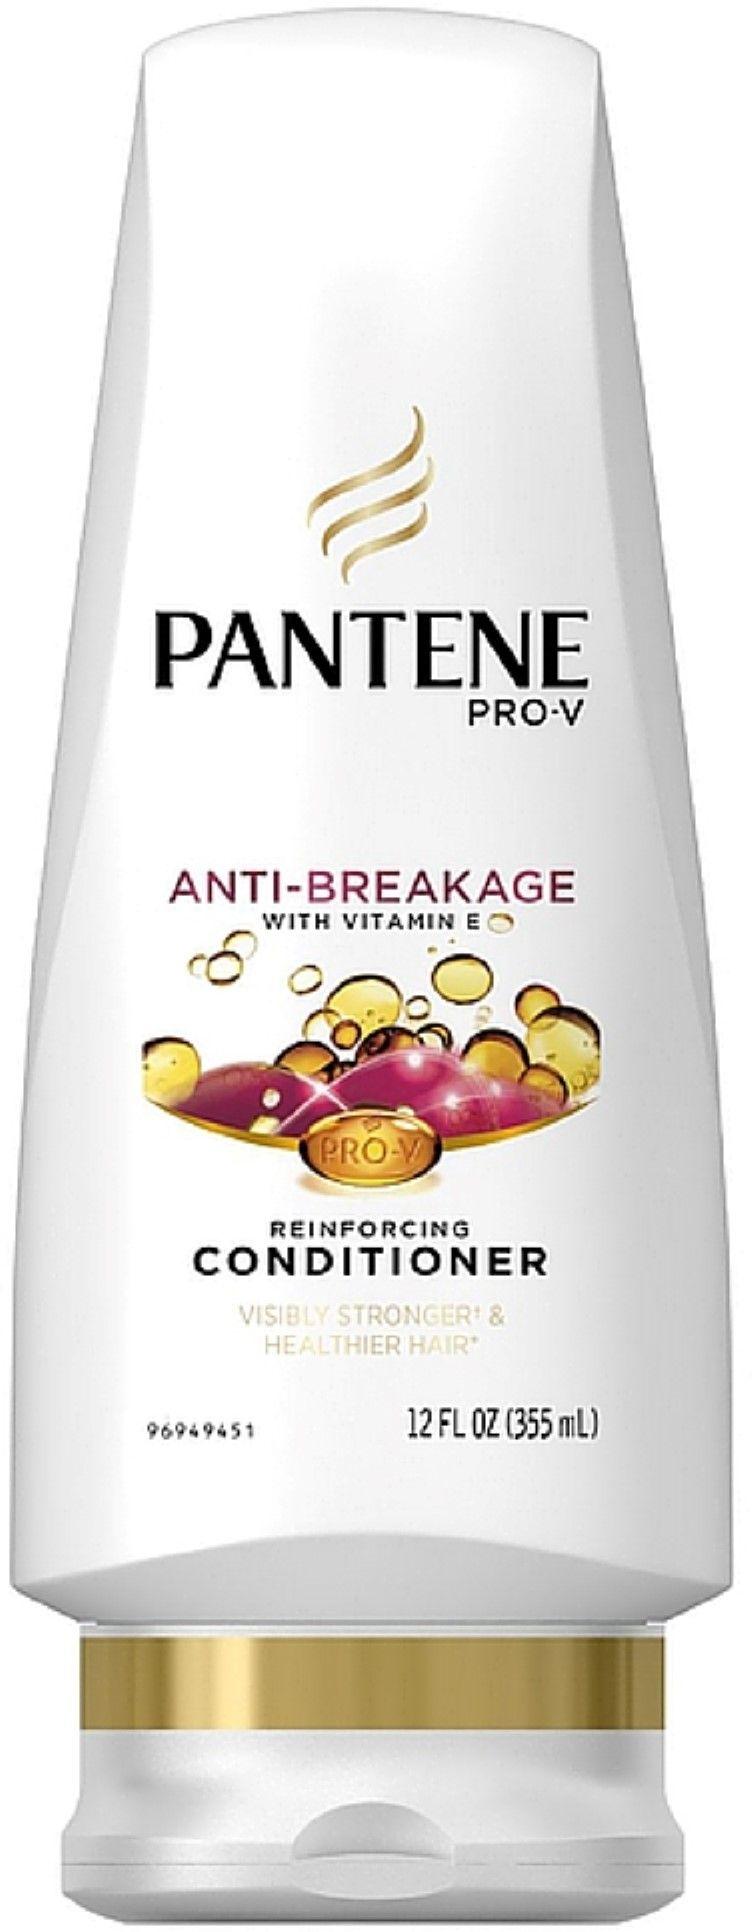 Pantene Pro-V Anti-Breakage Reinforcing Conditioner 12 oz